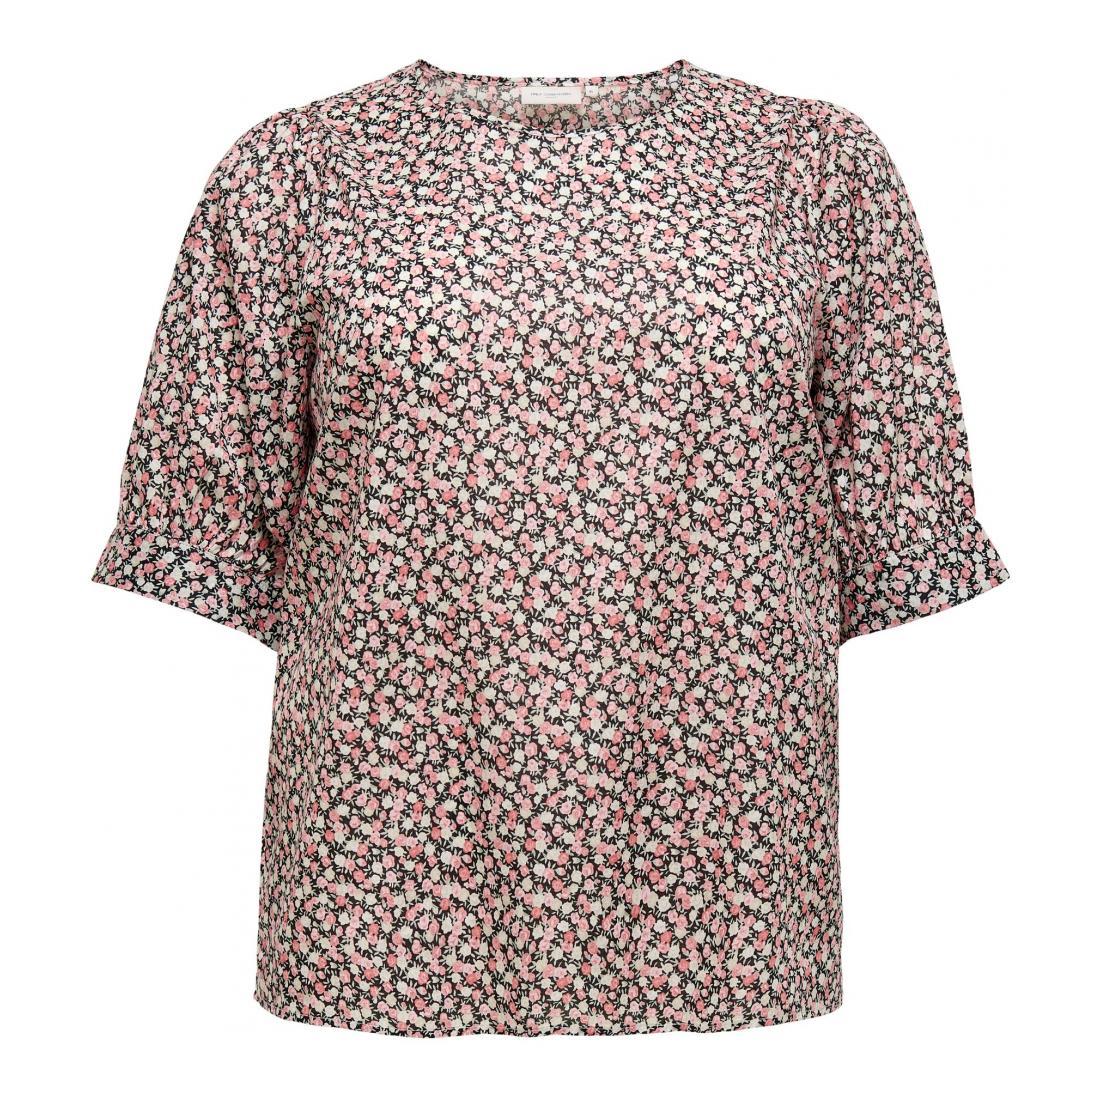 Only Carmakoma T-Shirt Damen CARLASSI 2/4 TOP